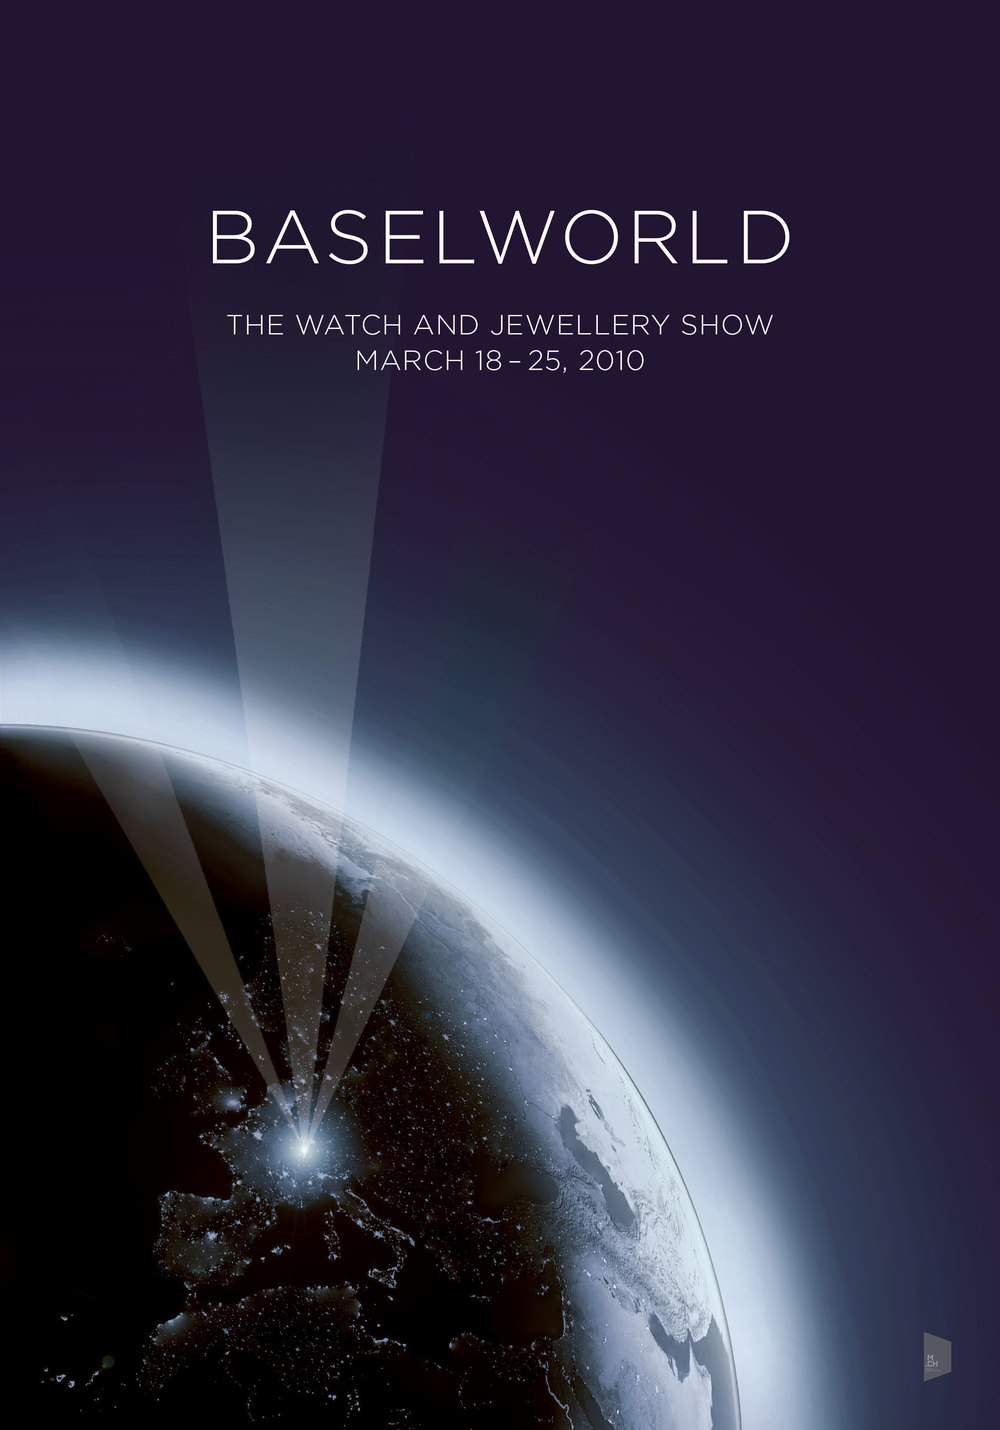 Baselworld 2010